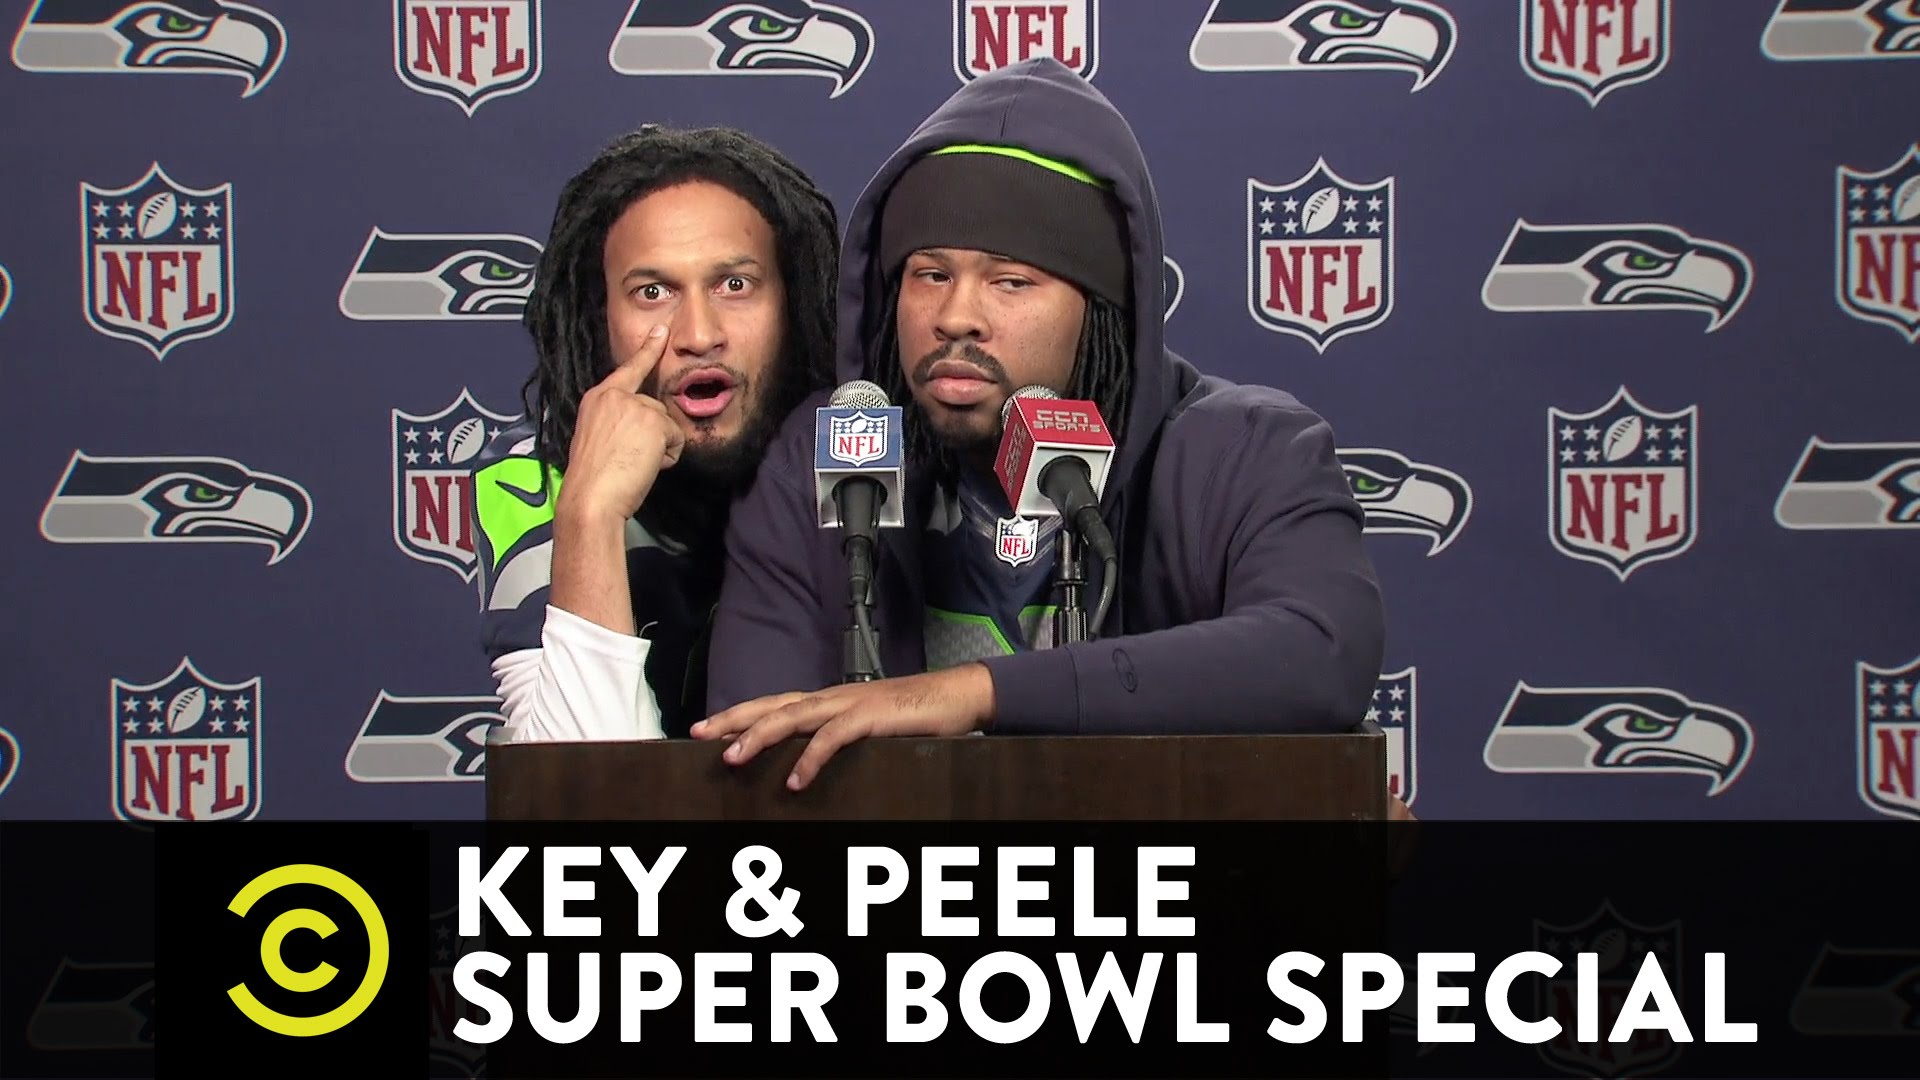 Key & Peele: Marshawn Lynch and Richard Sherman's Joint Press Conference